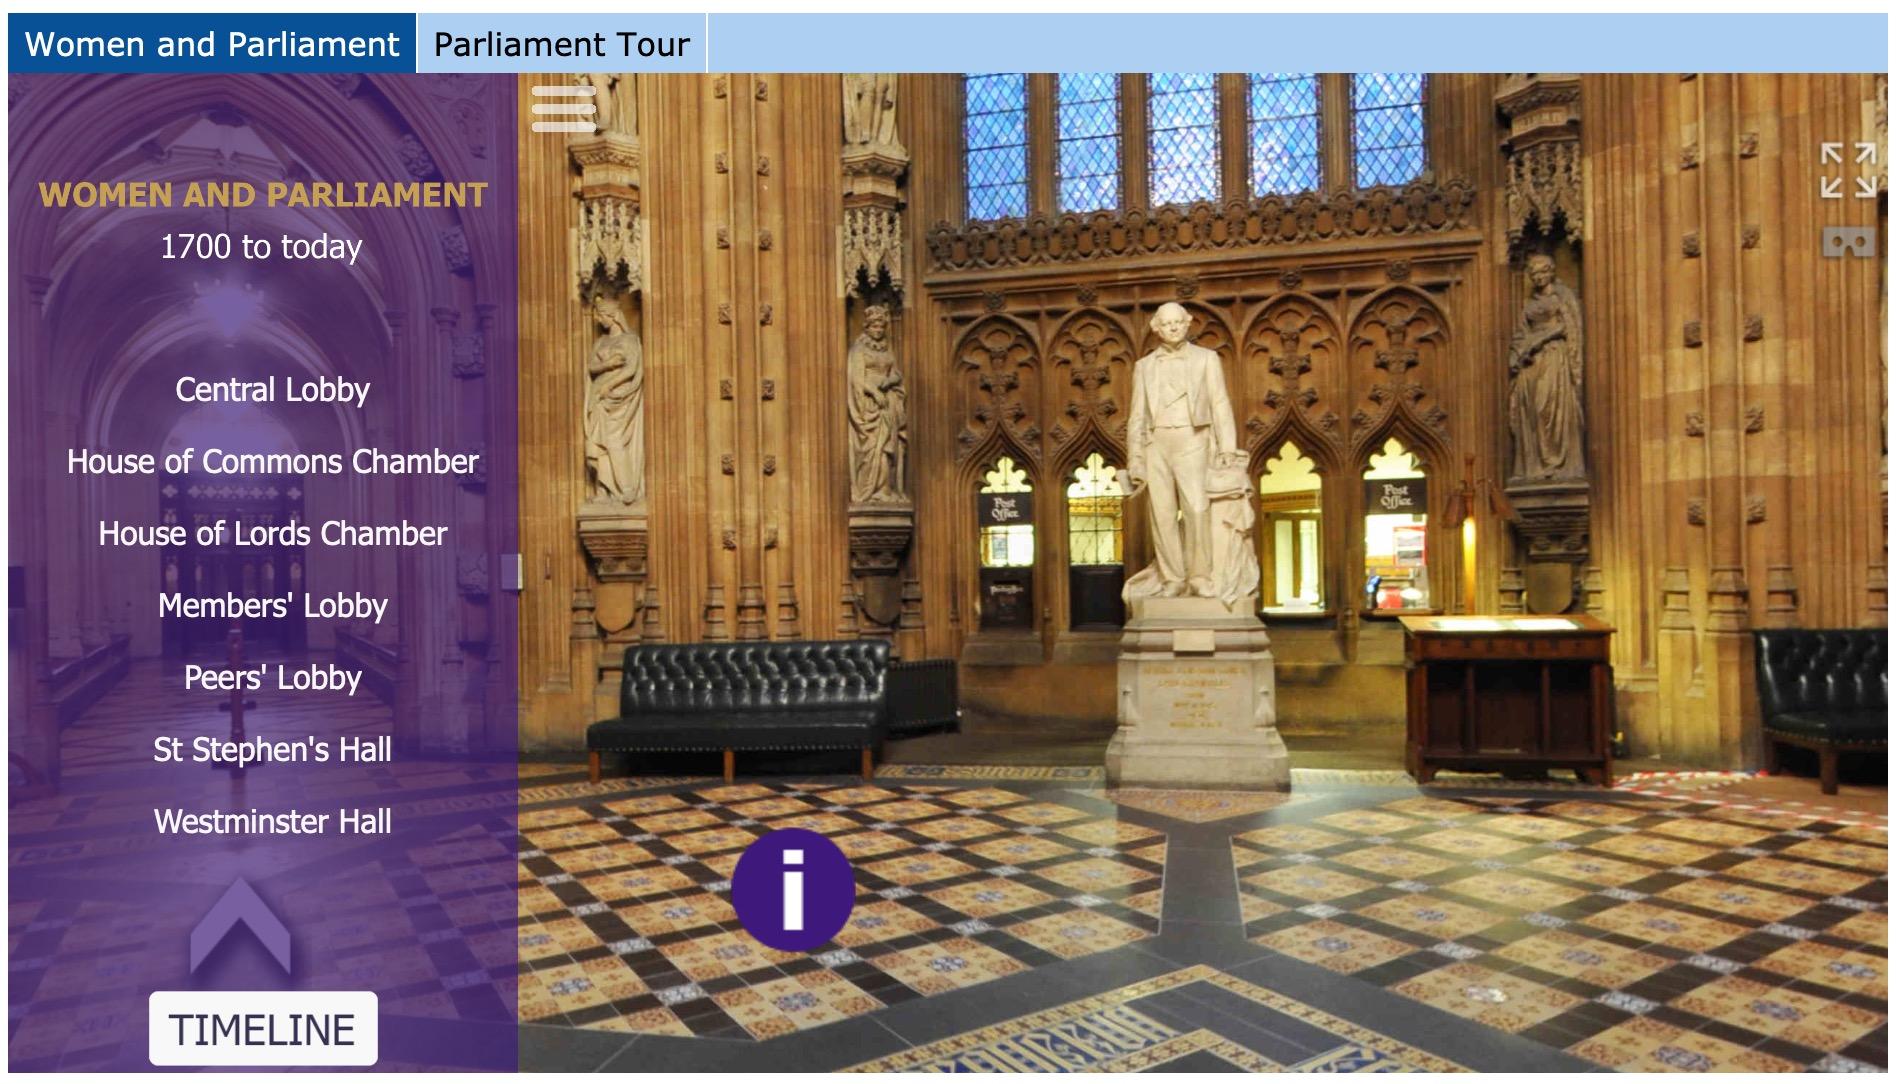 Women and Parliament Virtual Tour